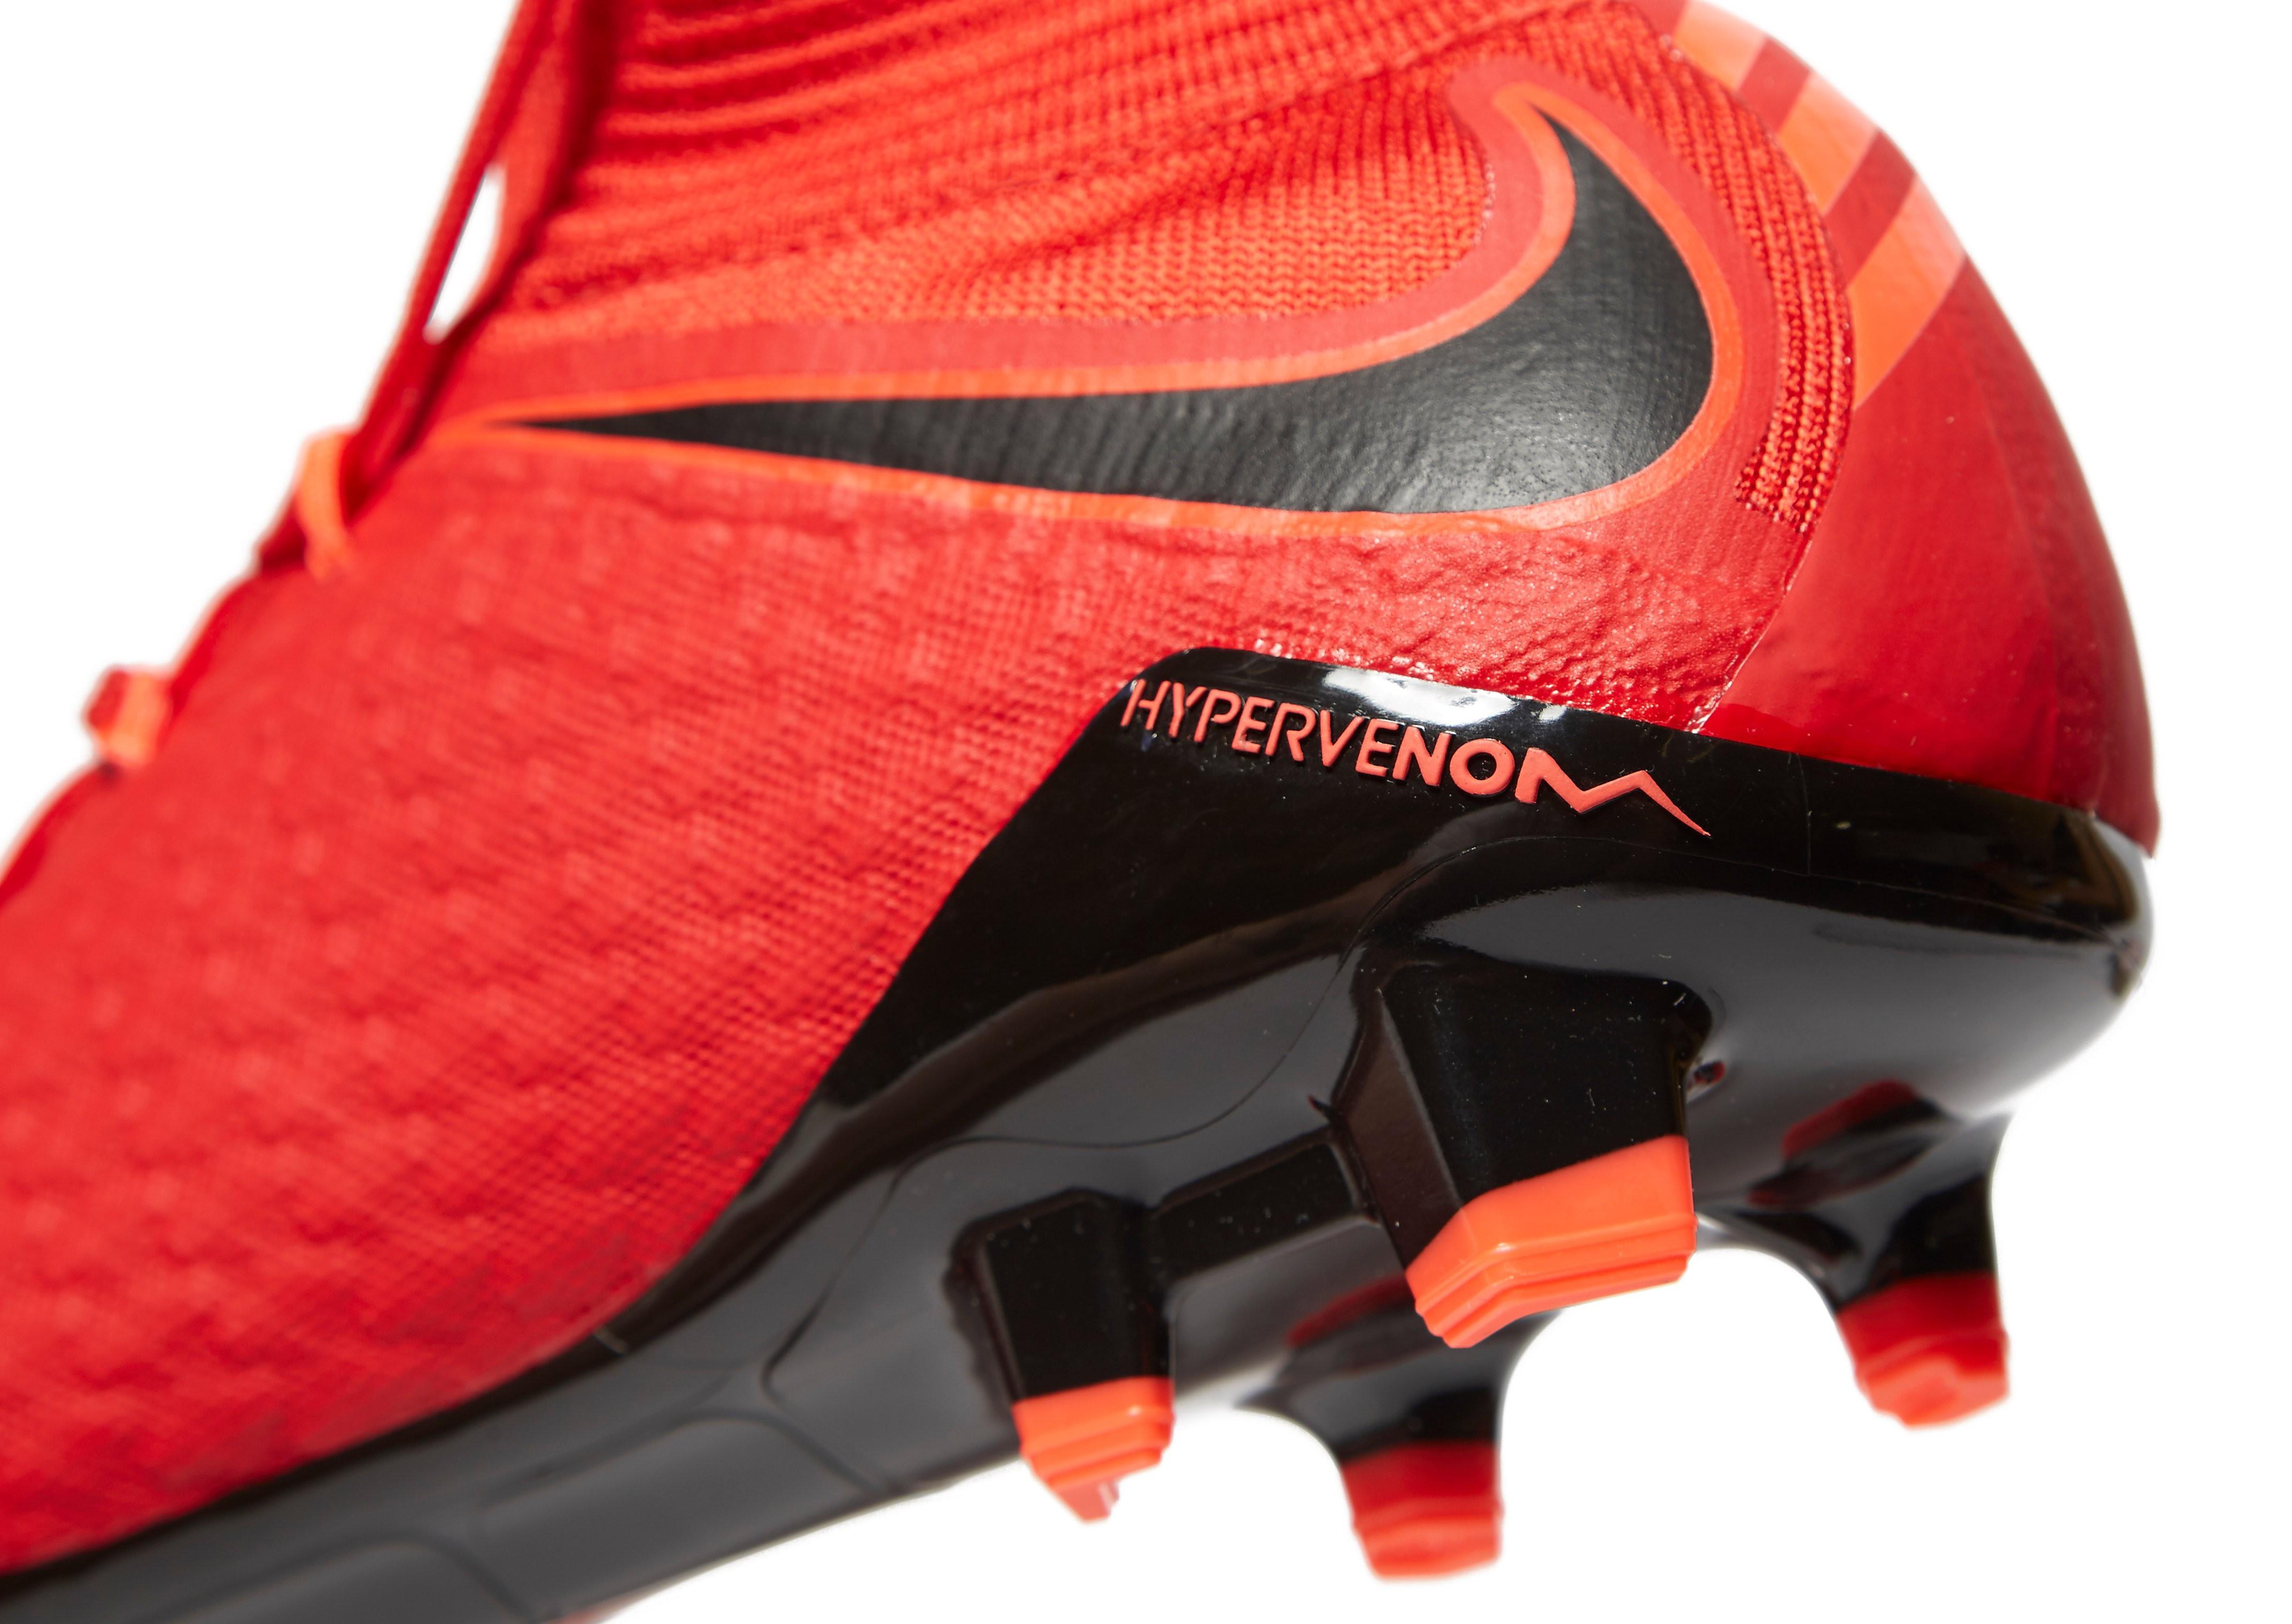 Nike Fire and Ice Hypervenom Phatal II FG